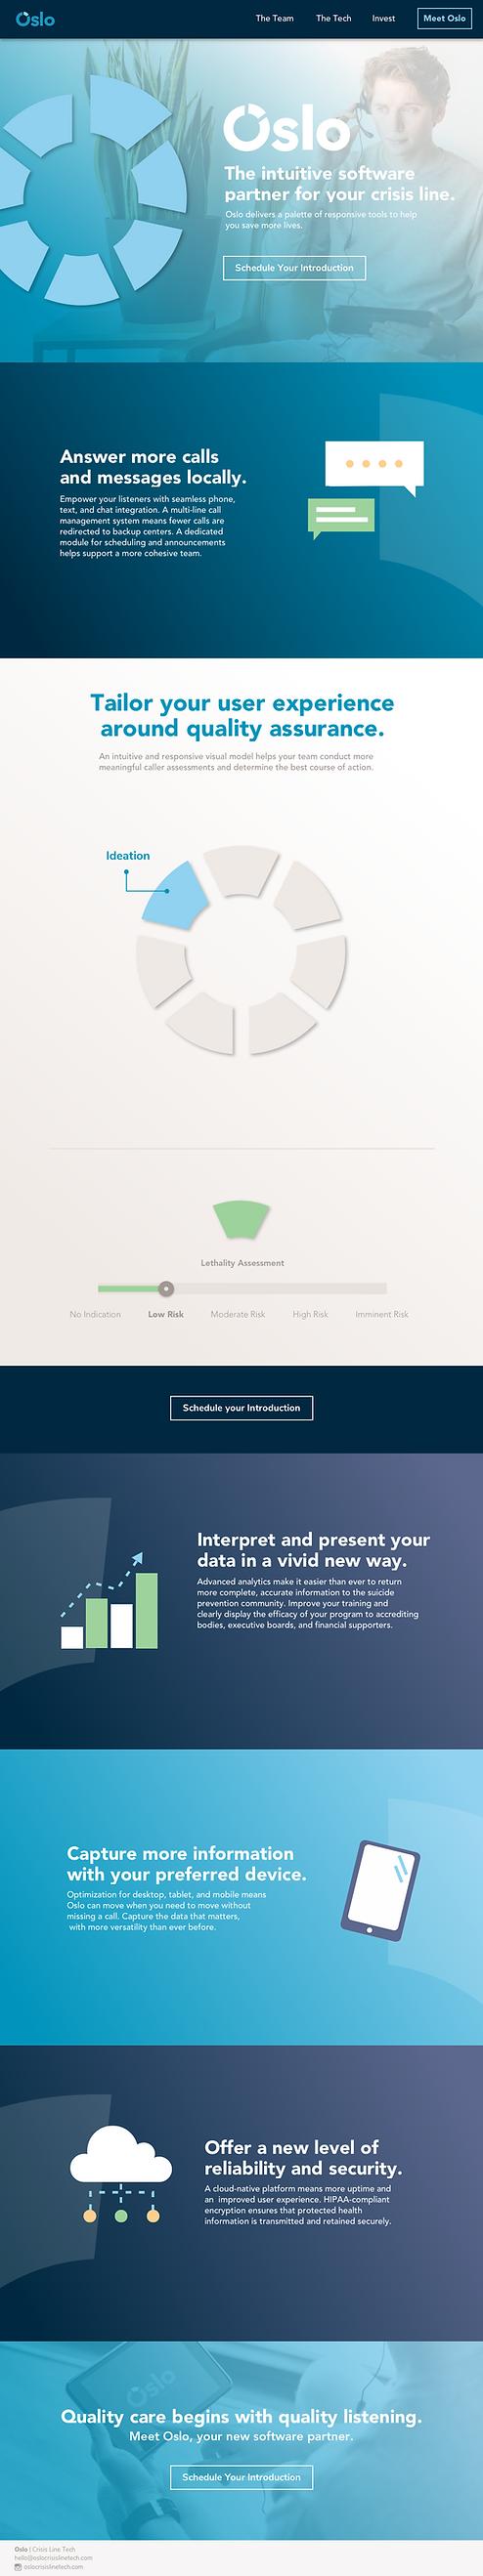 Oslo Crisis Line Technologies website design